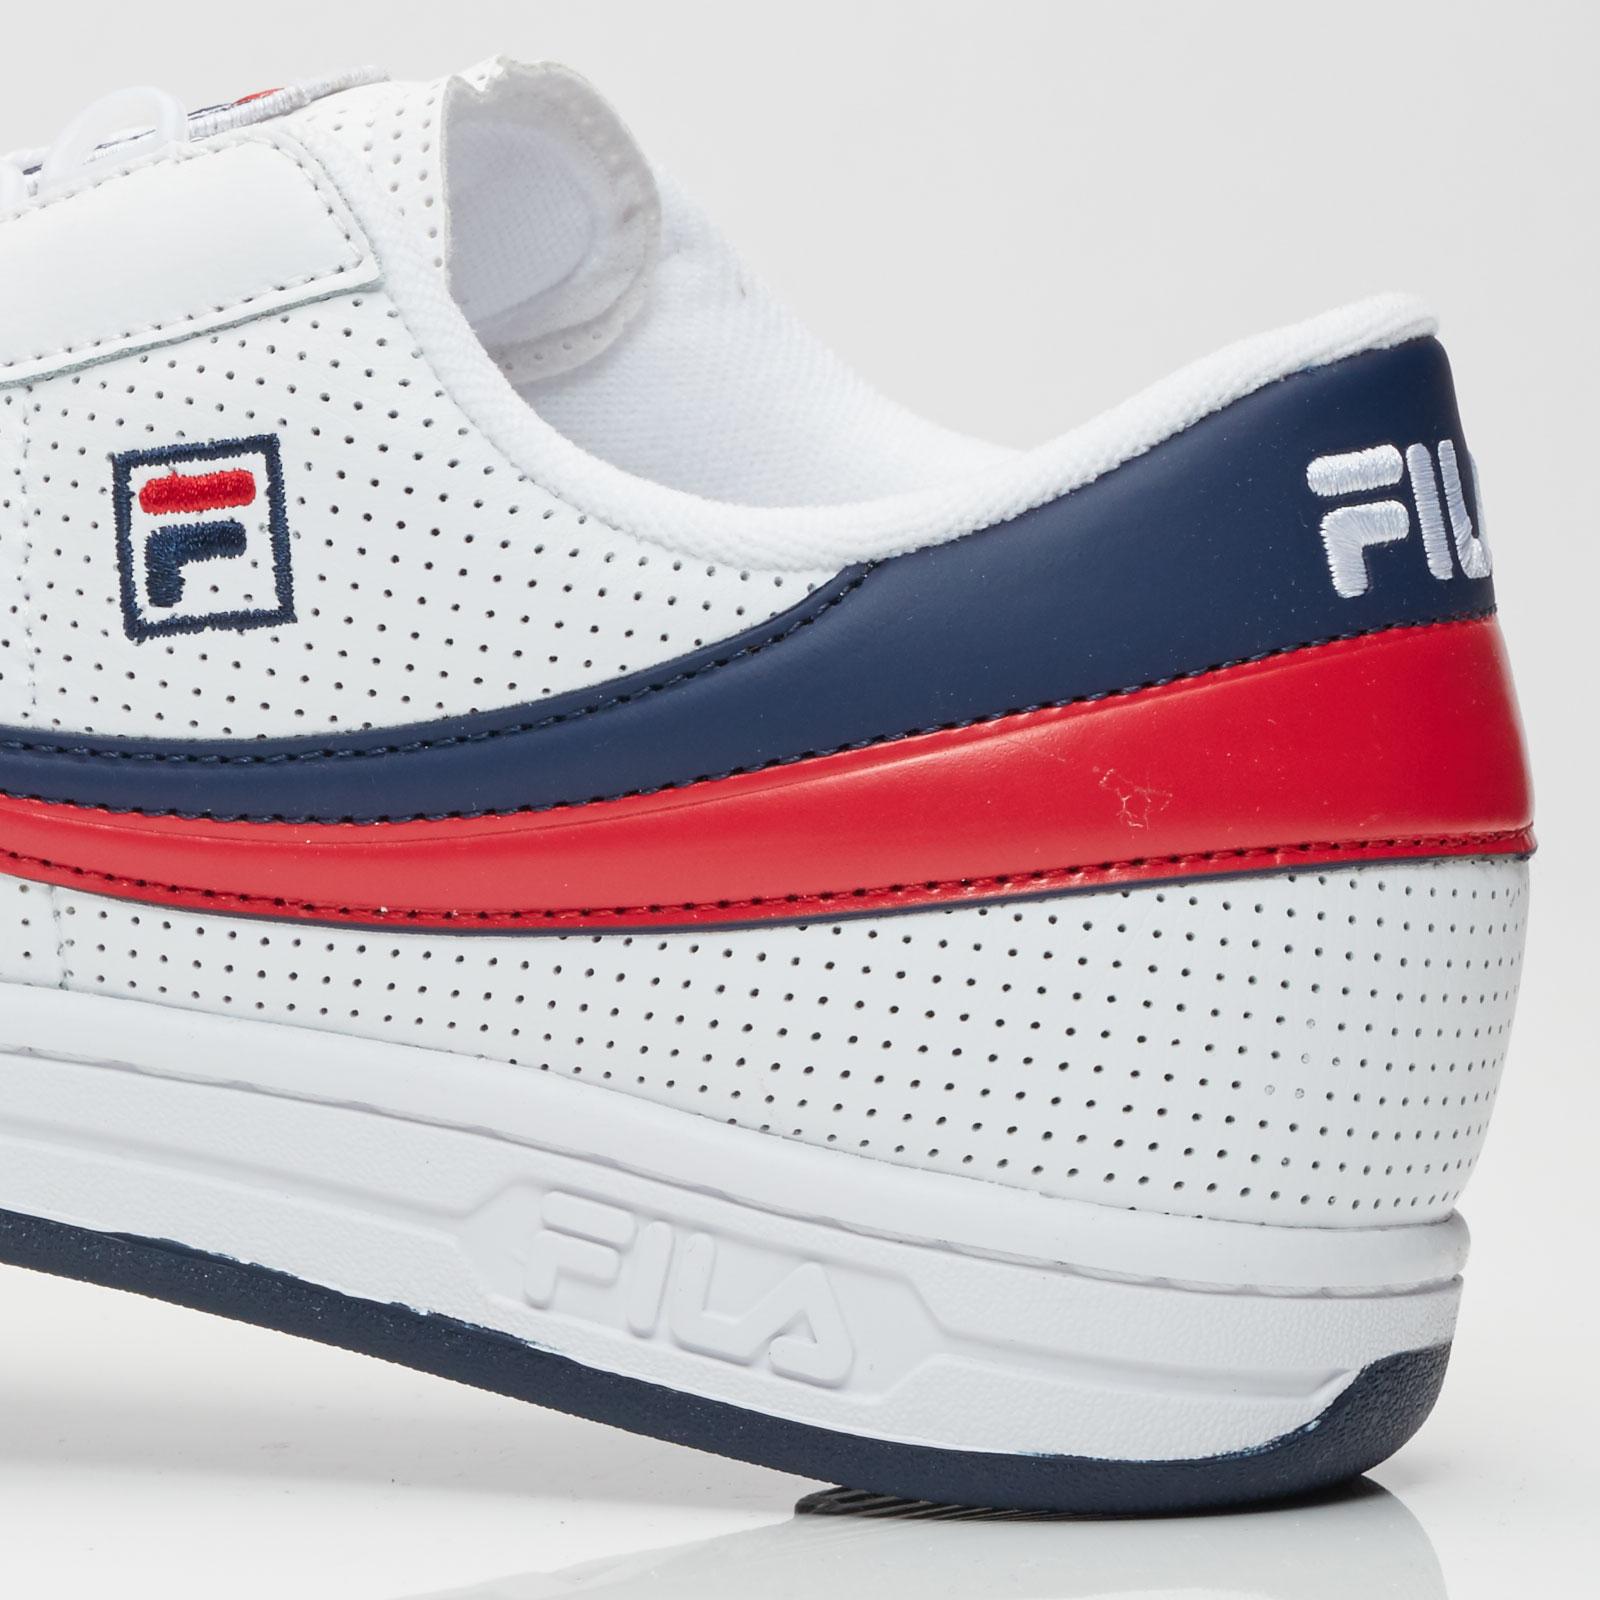 68670f37f0a4ff Fila Tennis Original Perf - 1vt13607-150 - Sneakersnstuff | sneakers ...